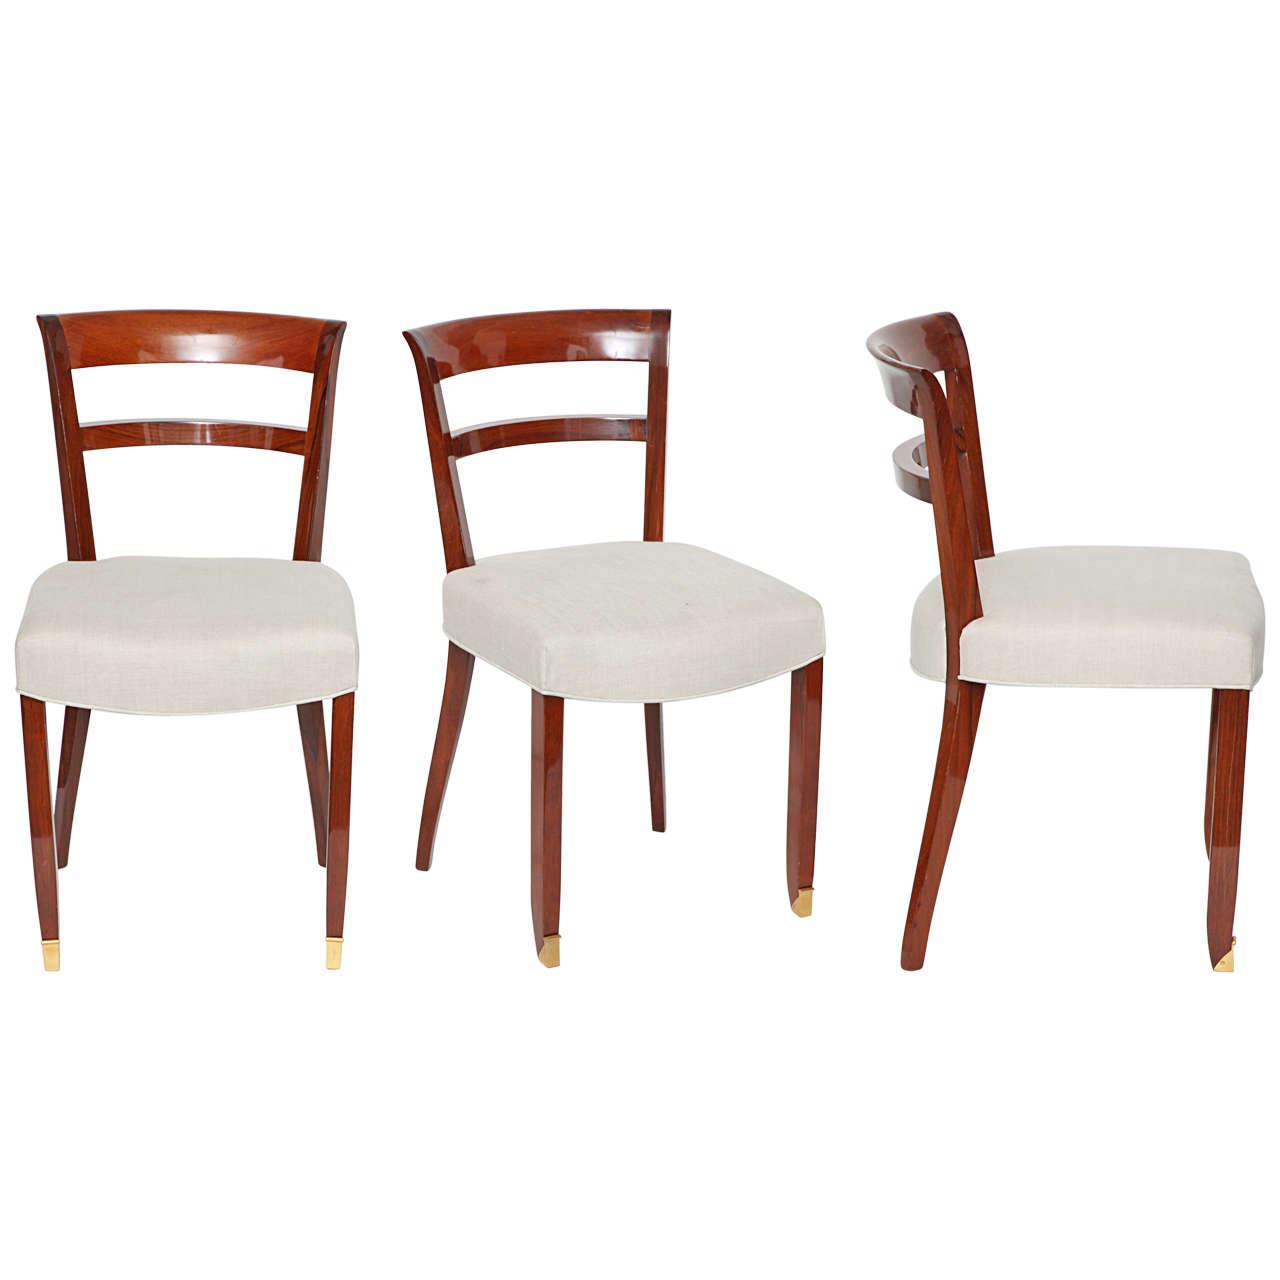 Jules Leleu, Set of Three Mahogany Side Chairs, France, C. 1930